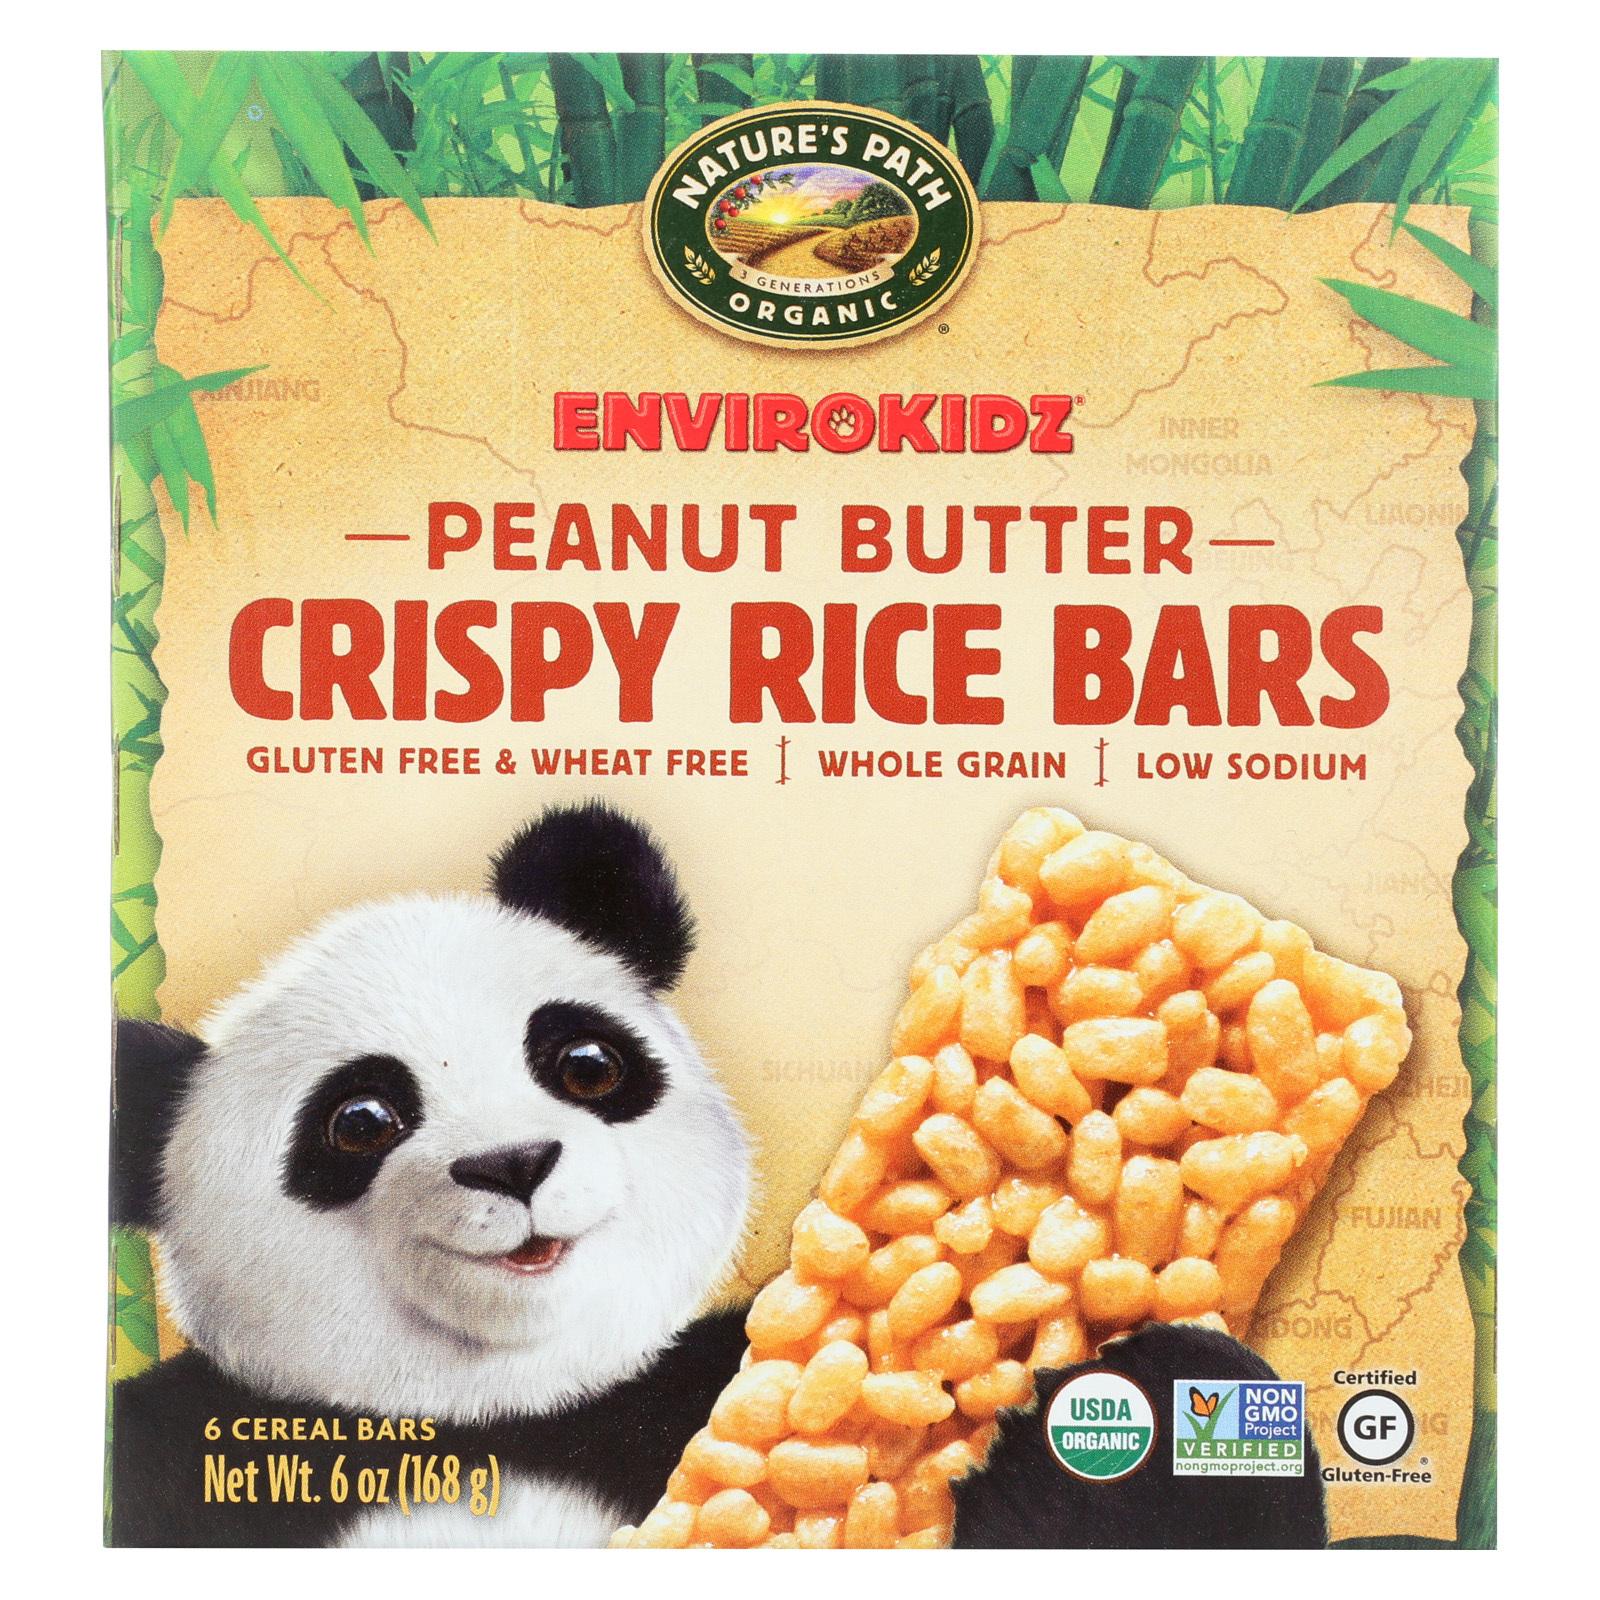 Envirokidz Crispy Rice Bars - Peanut Butter - Case of 6 - 6 oz.